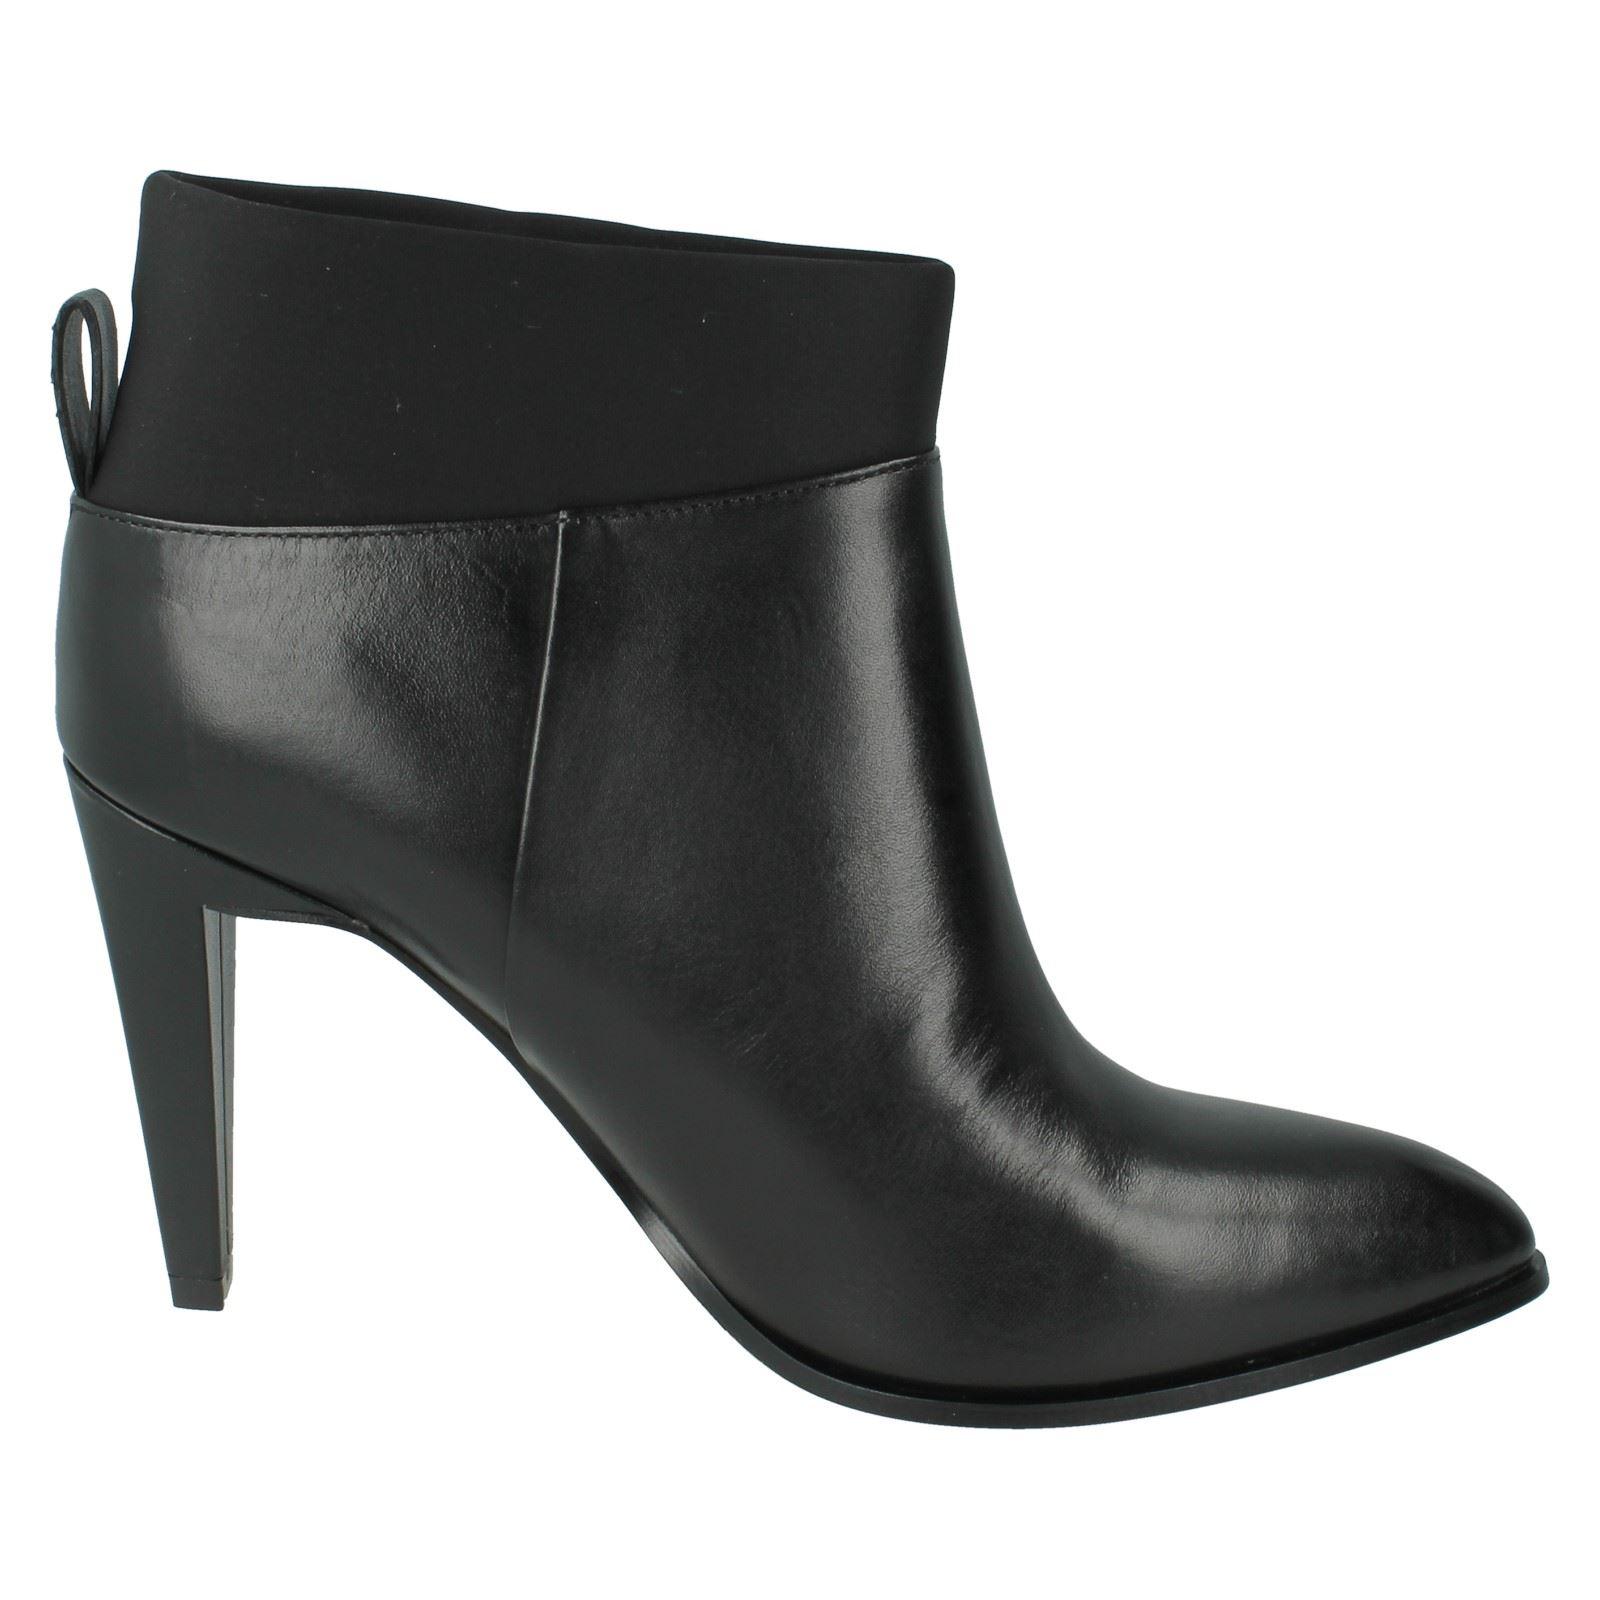 clarks ankle boots azizi posey ebay